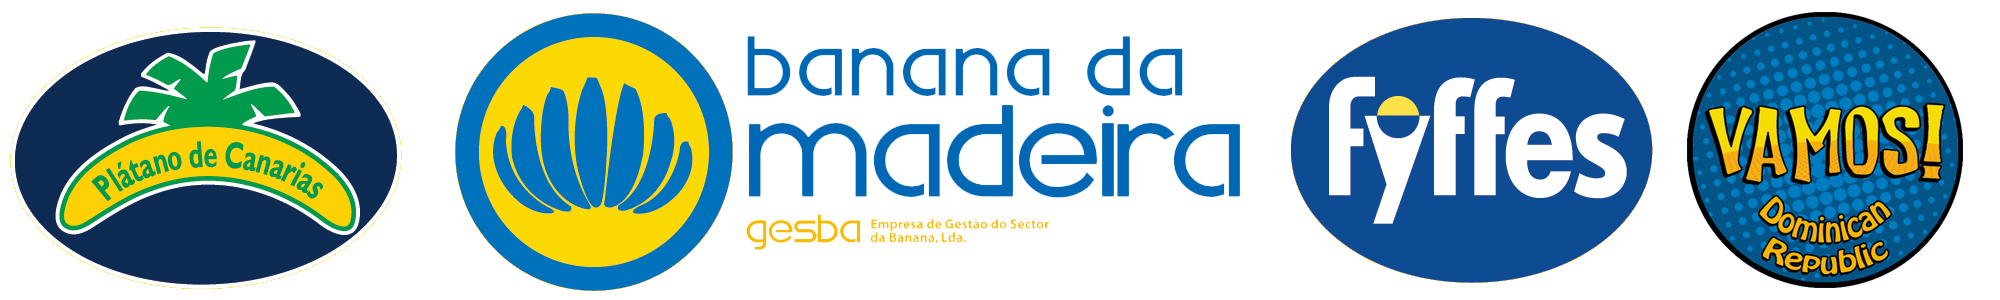 banana da madeira logos